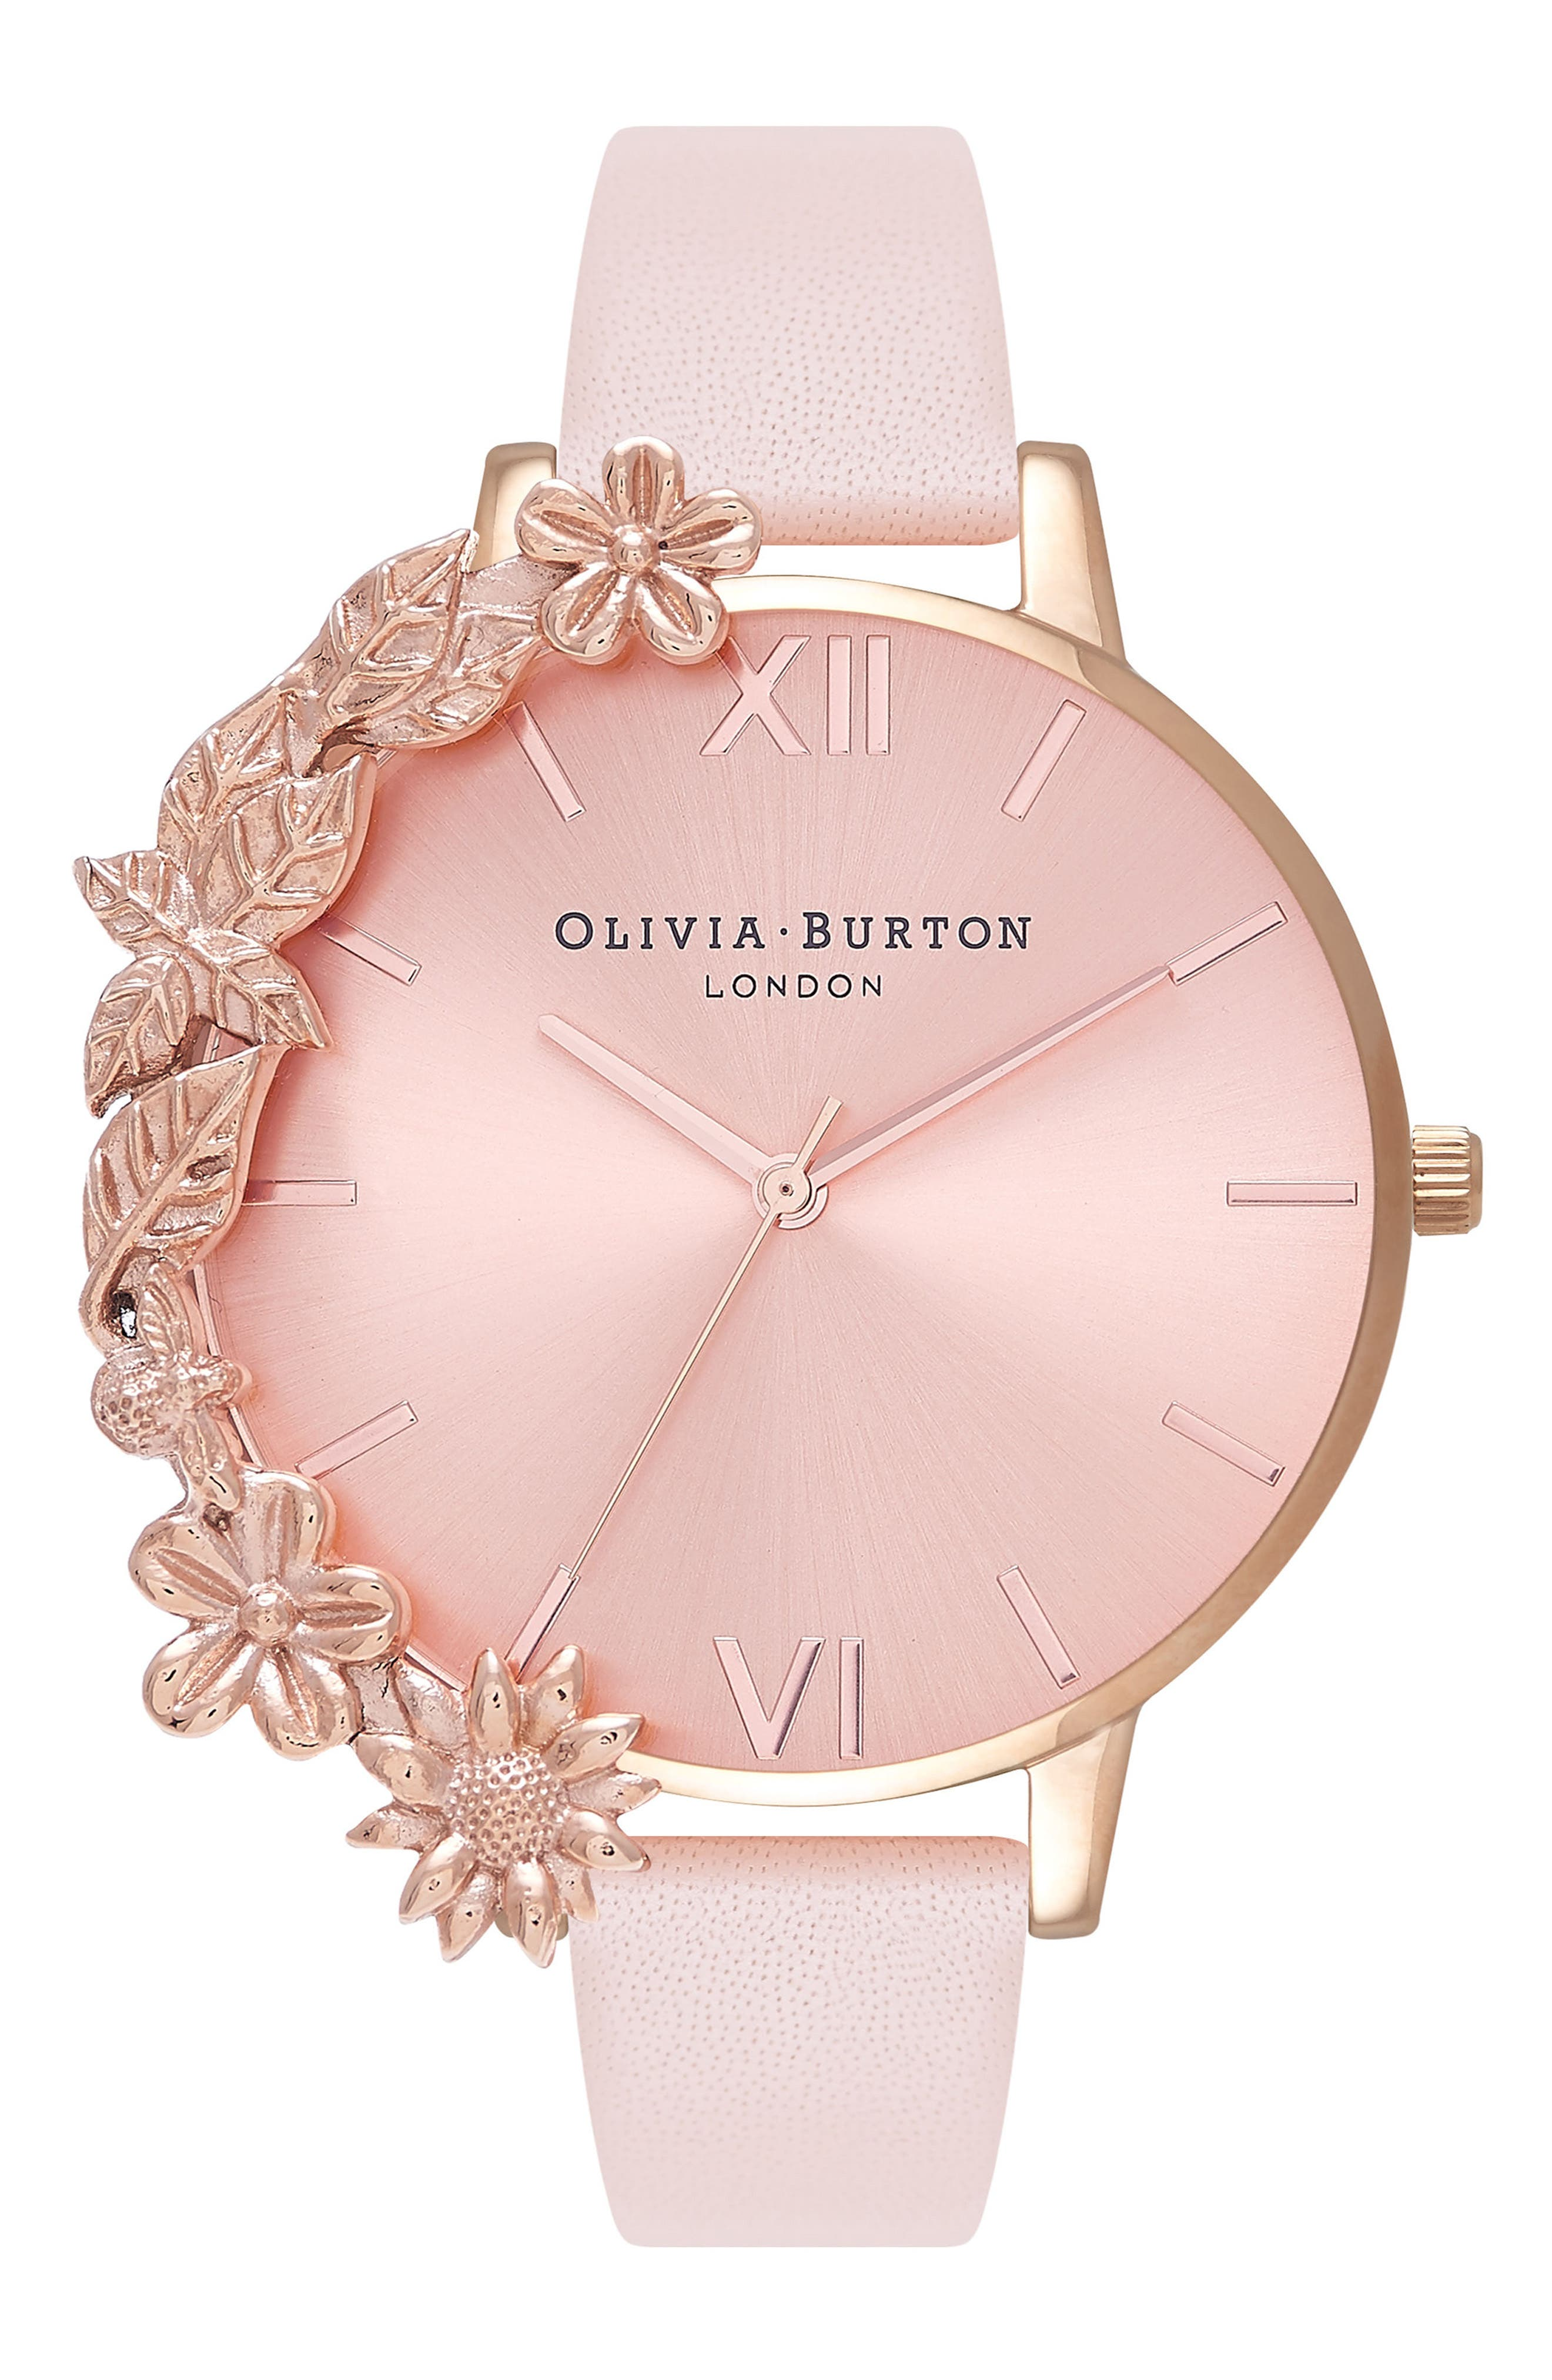 OLIVIA BURTON Case Cuff Leather Strap Watch, 38mm, Main, color, ROSE GOLD